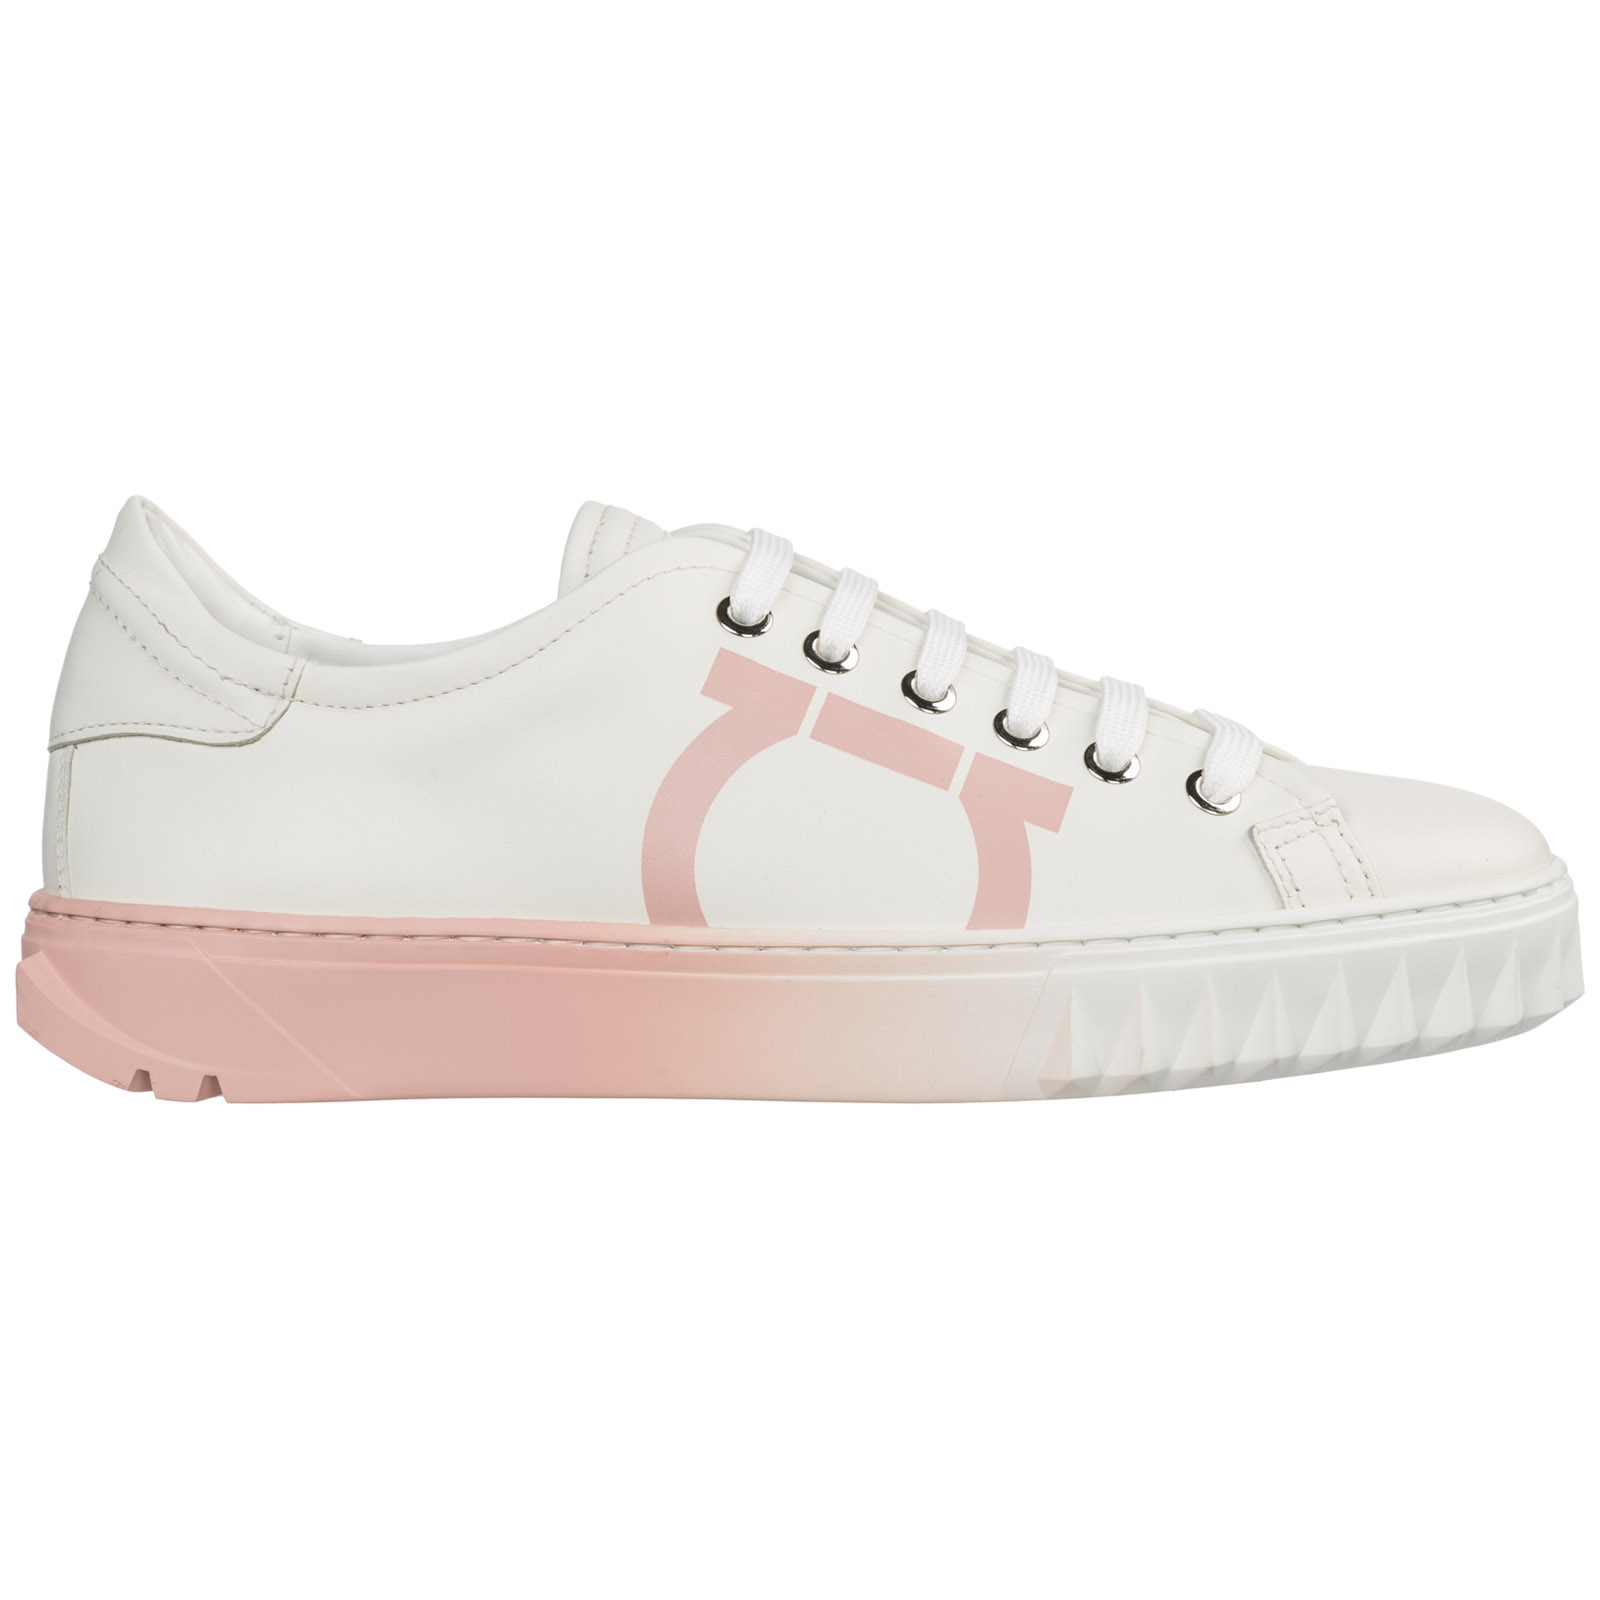 Salvatore Ferragamo Women's Shoes Leather Trainers Sneakers Gancini In White